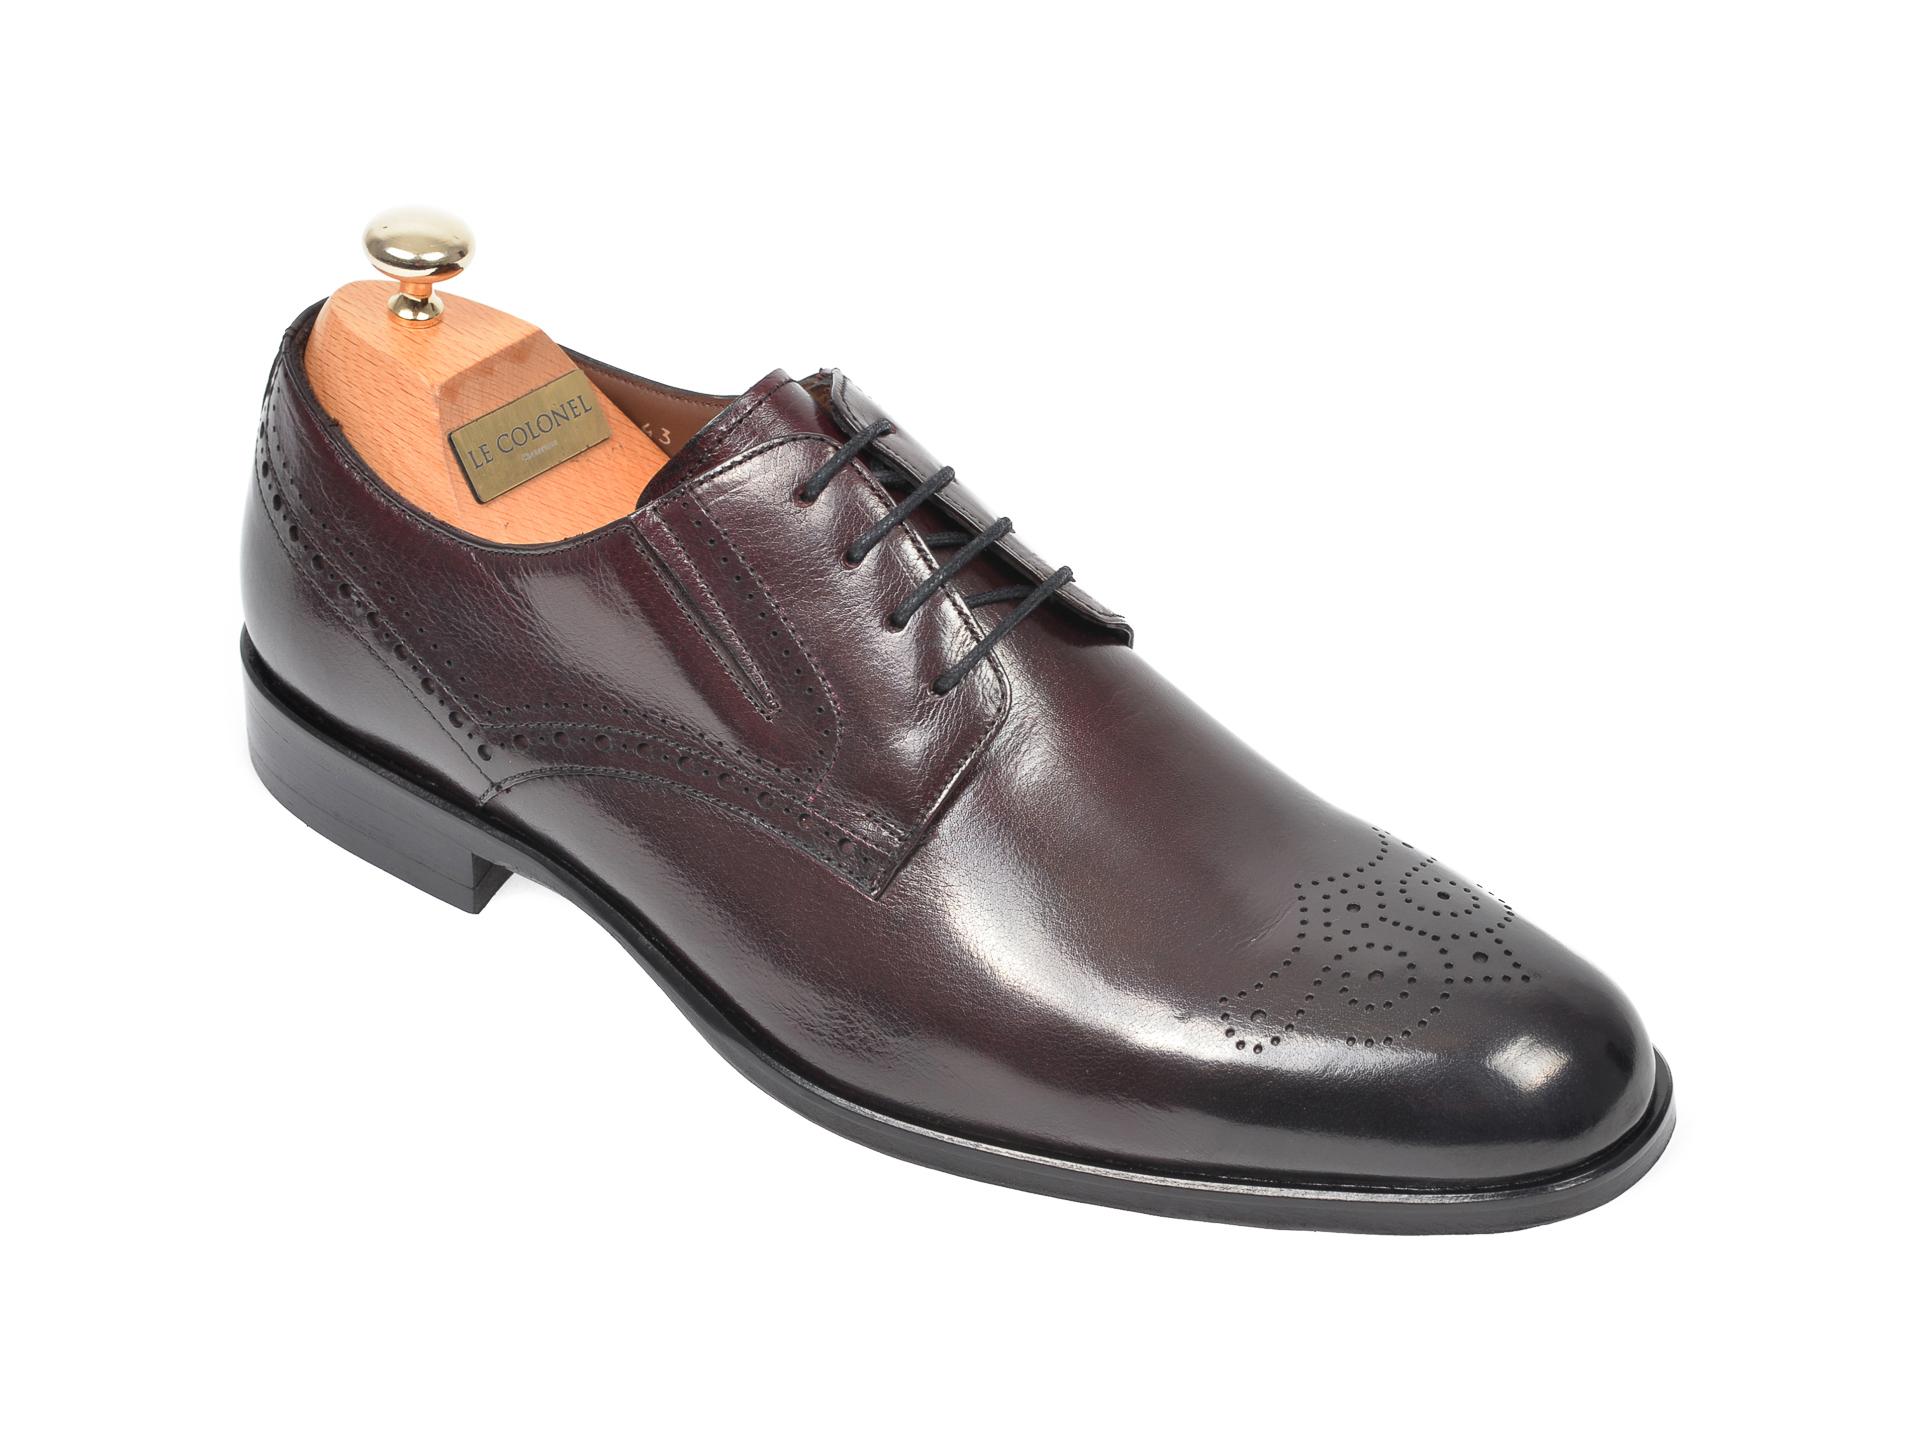 Pantofi LE COLONEL visinii, 62401, din piele naturala imagine